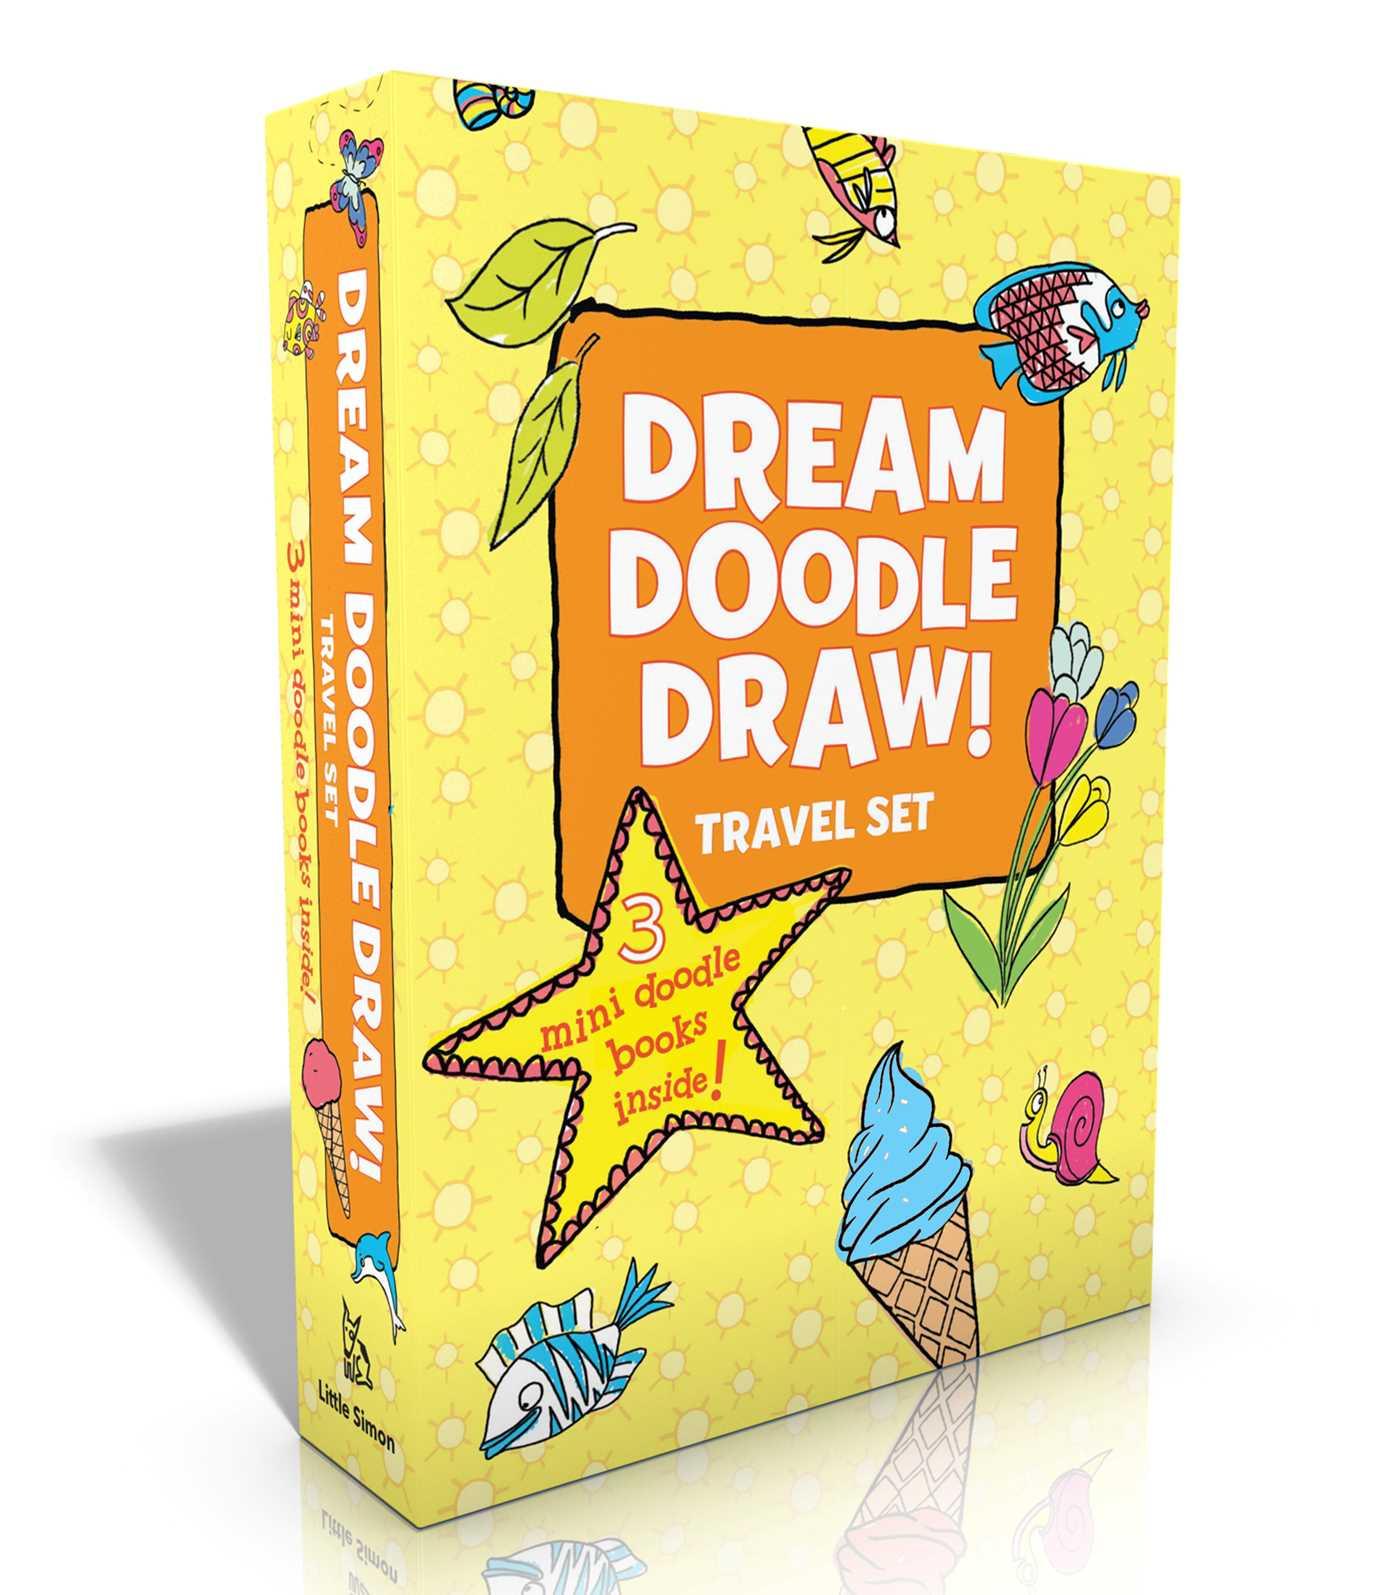 Dream doodle draw travel set 9781481491976 hr